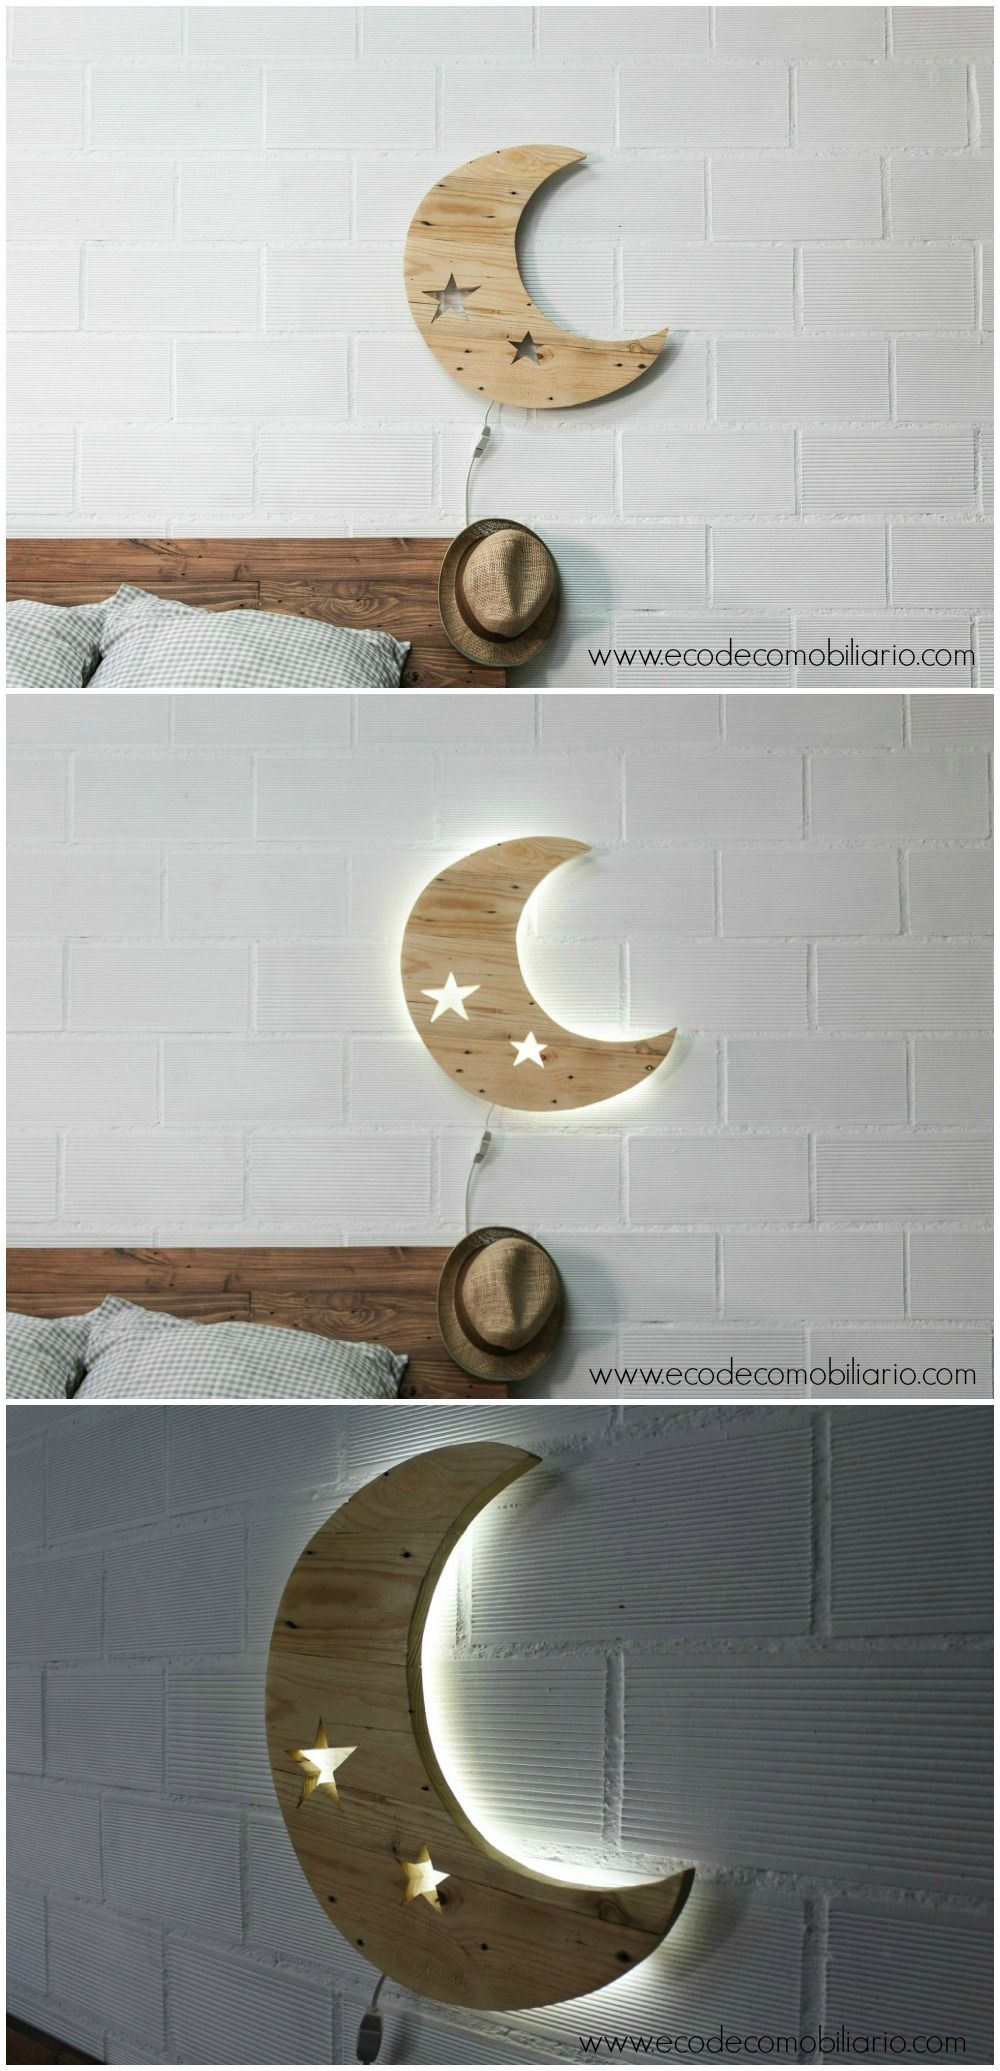 L mpara de palets con forma de luna l mpara infantil - Lamparas habitaciones infantiles ...